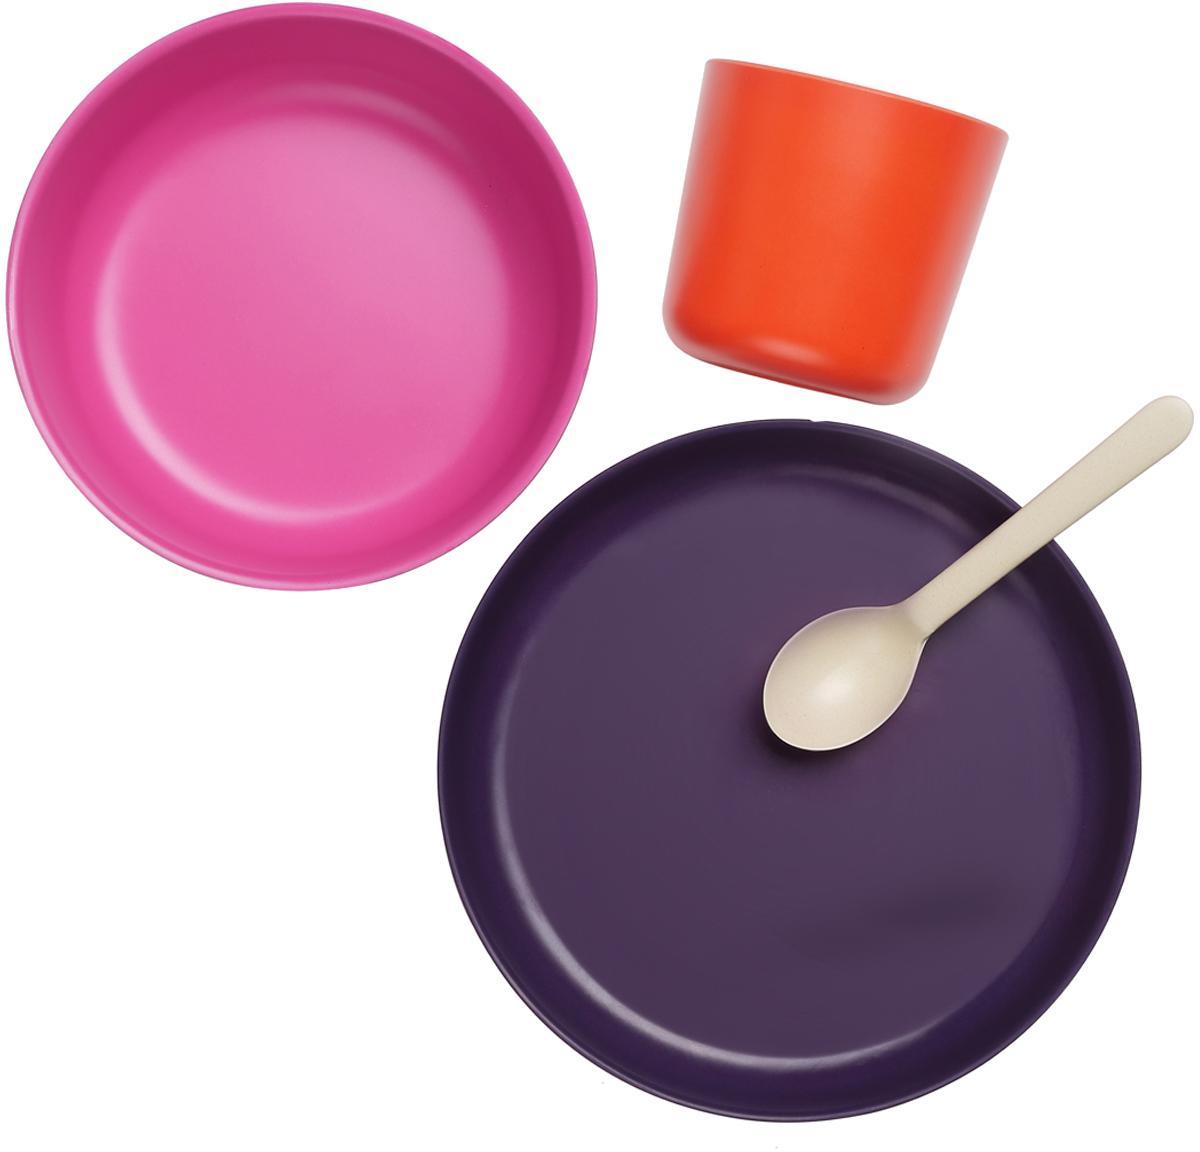 Frühstücksset Ume, 4-tlg., Bambusfasern, Melamin, lebensmittelecht BPA, PVC und Phthalate frei, Violett, Rosa, Rot, Cremeweiss, Set mit verschiedenen Grössen